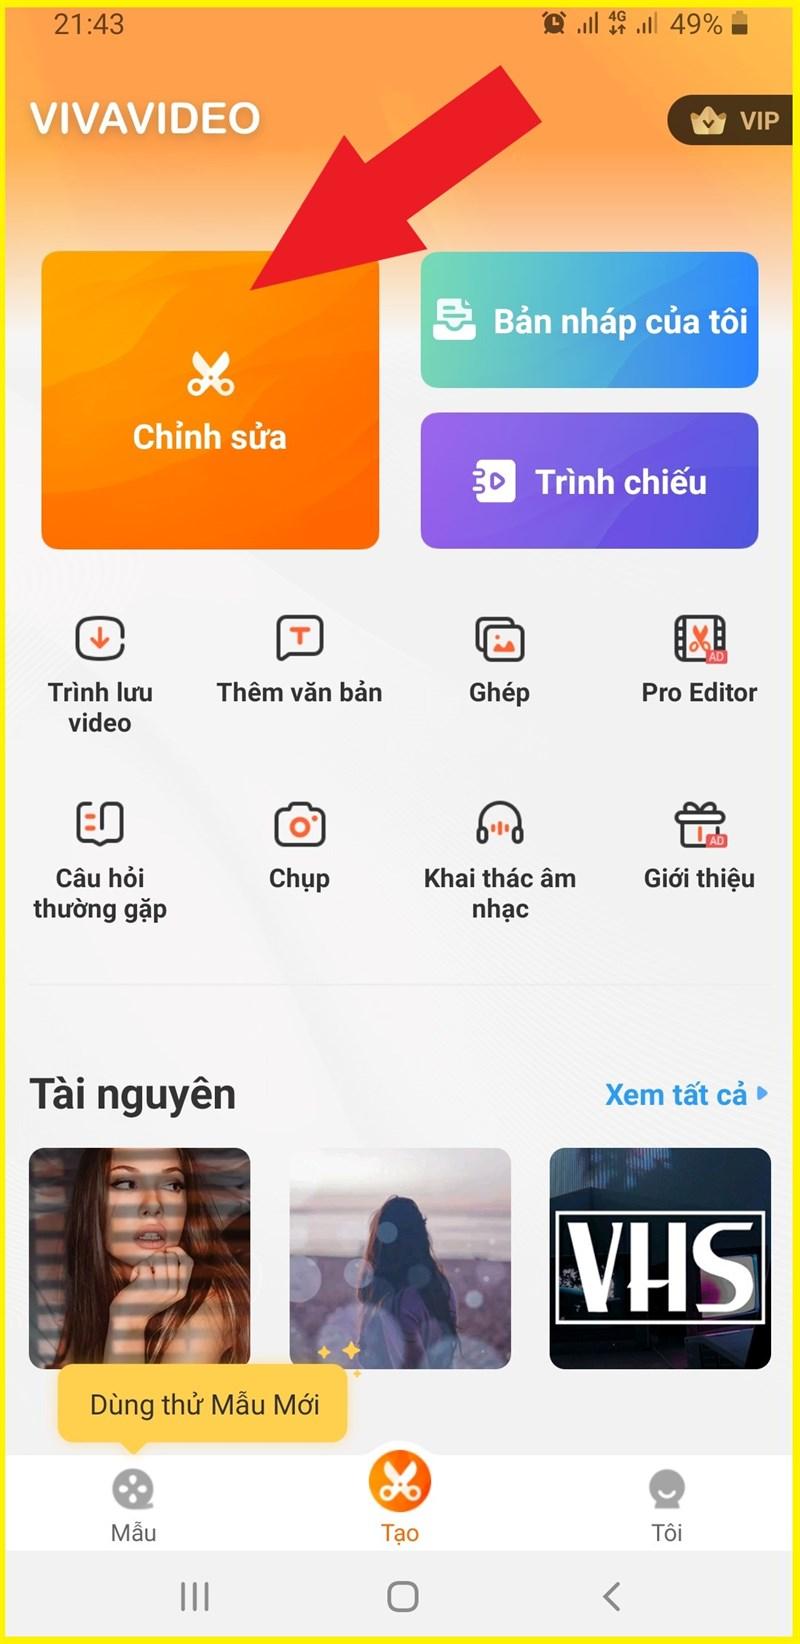 https://www.totolink.vn/public/uploads/img_article/Posts/711/bam-vao-chinh-sua-de-tien-hanh-chen-nhac-cho-video-cua-ban.jpg